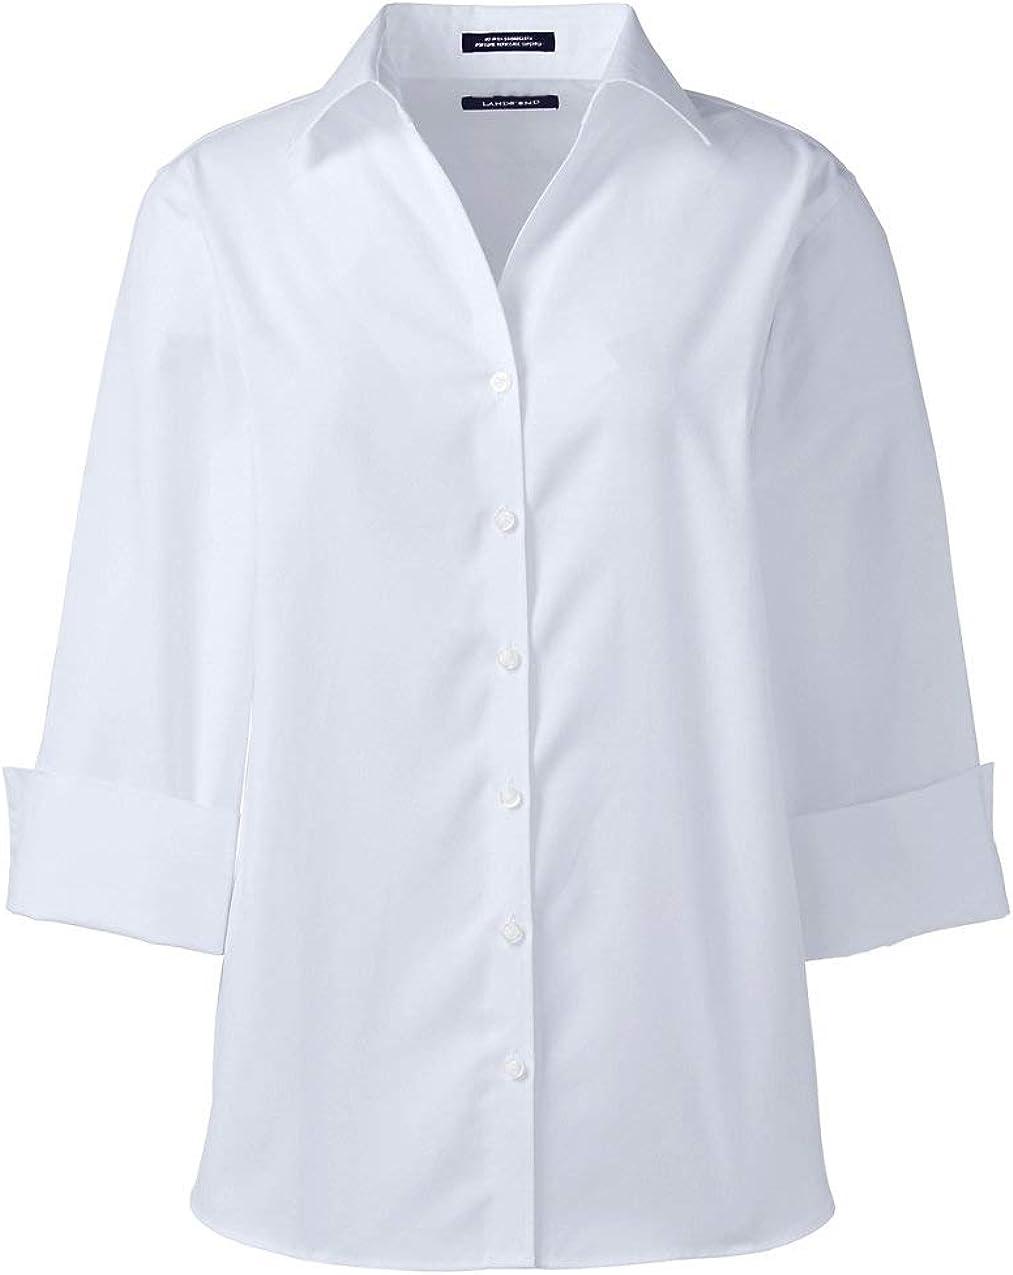 Lands' End Women's 3/4 Sleeve No Iron Broadcloth Shirt